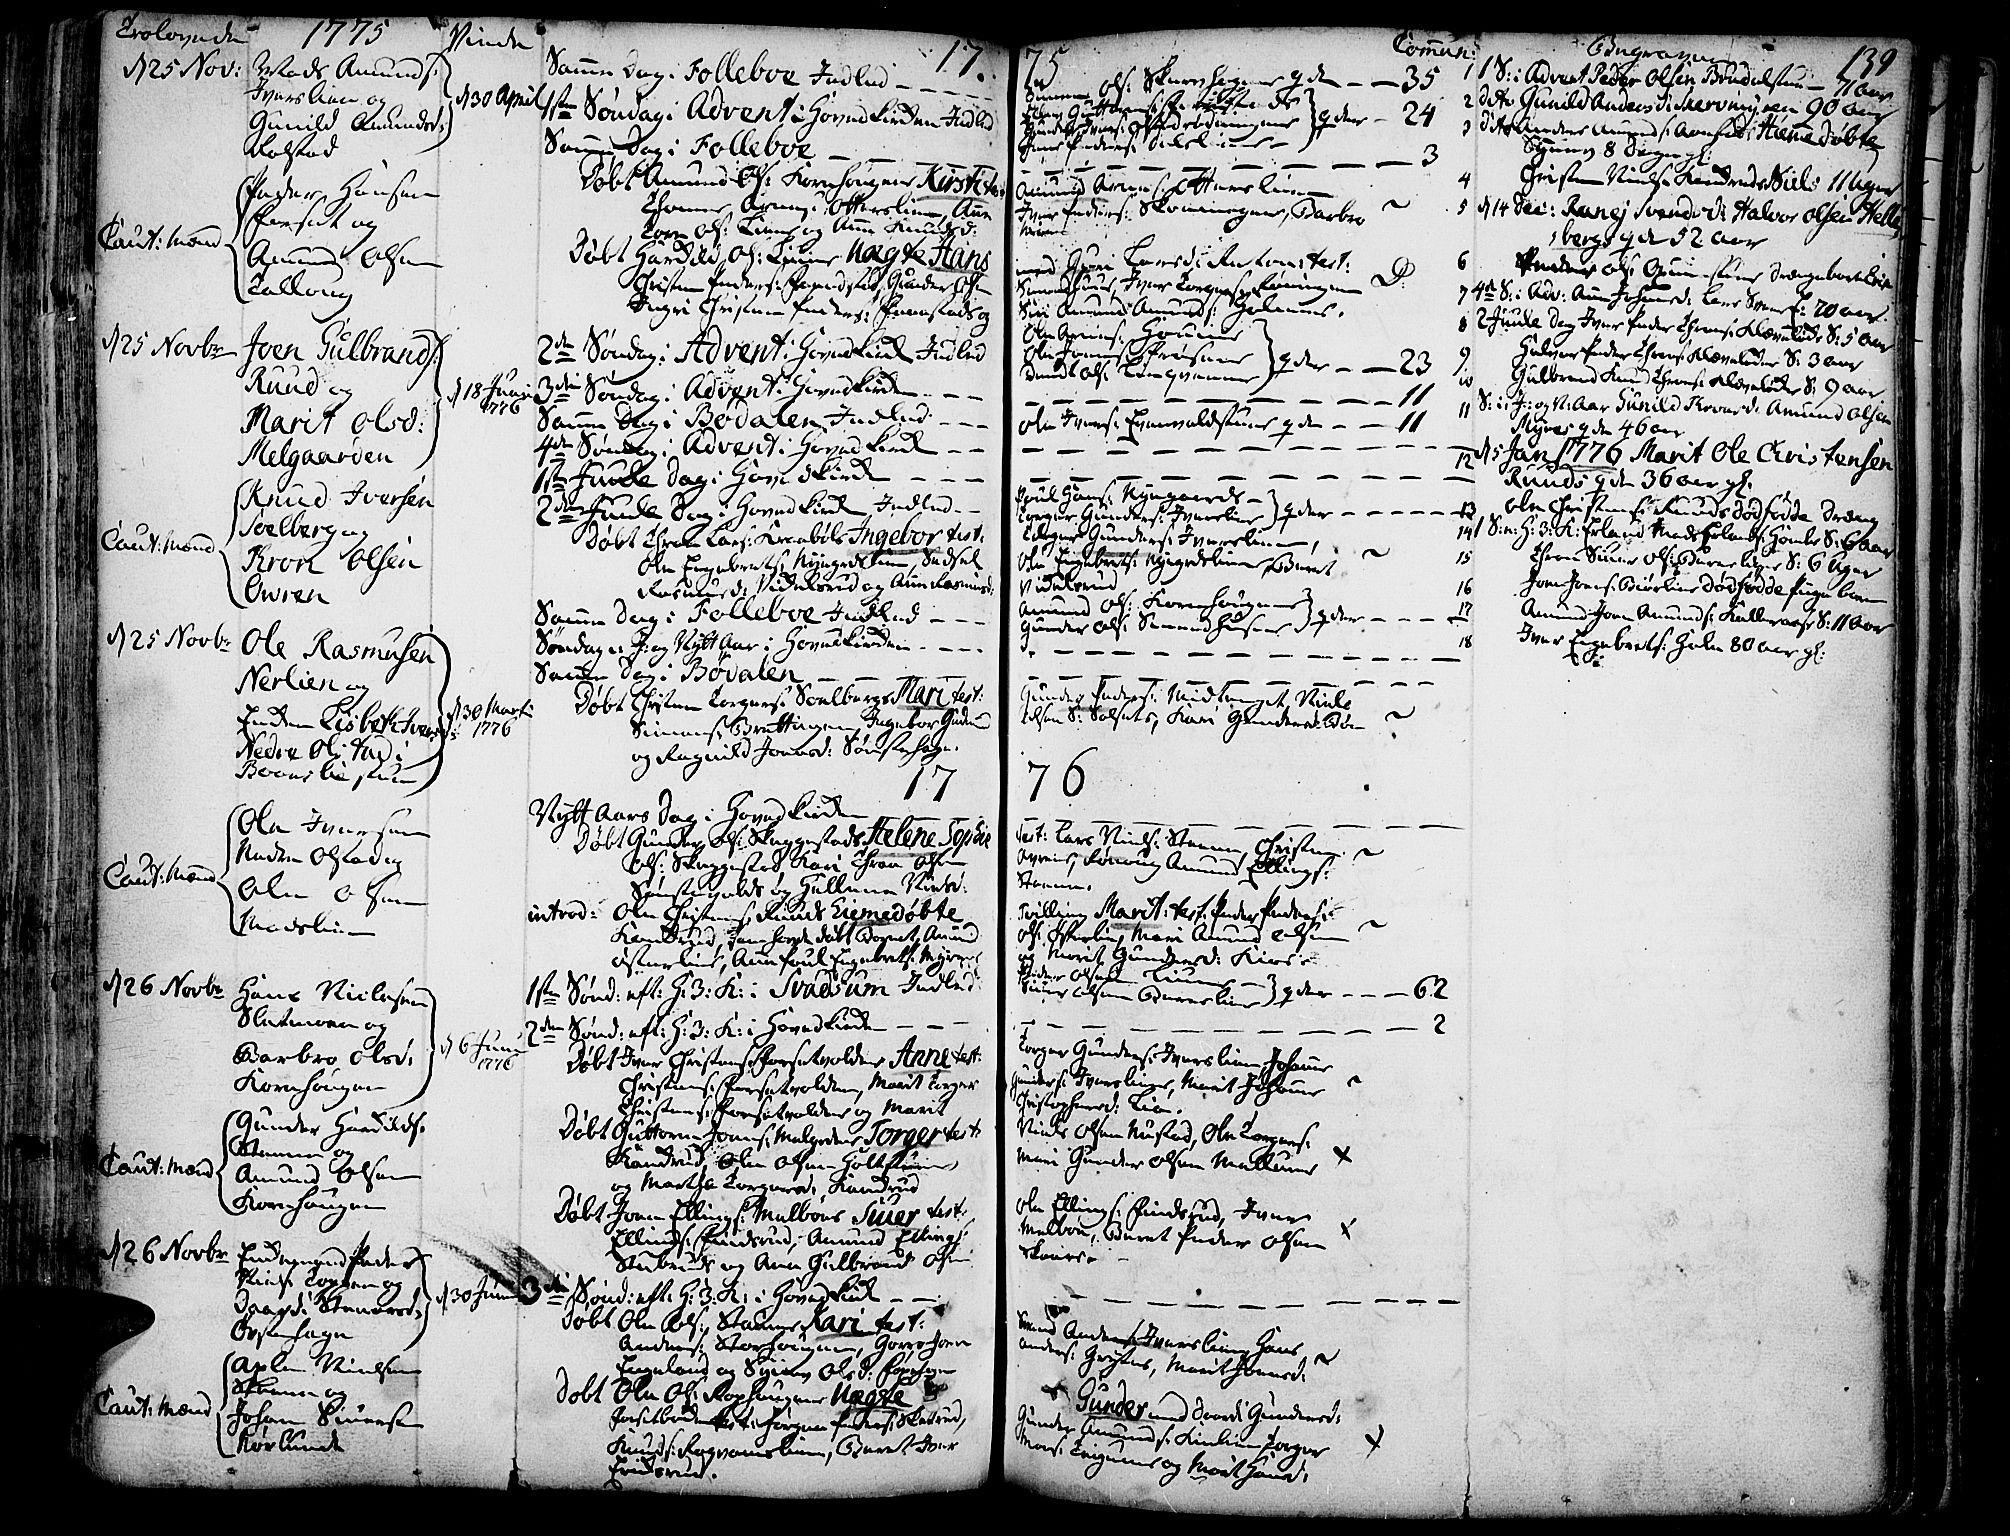 SAH, Gausdal prestekontor, Ministerialbok nr. 3, 1758-1809, s. 139